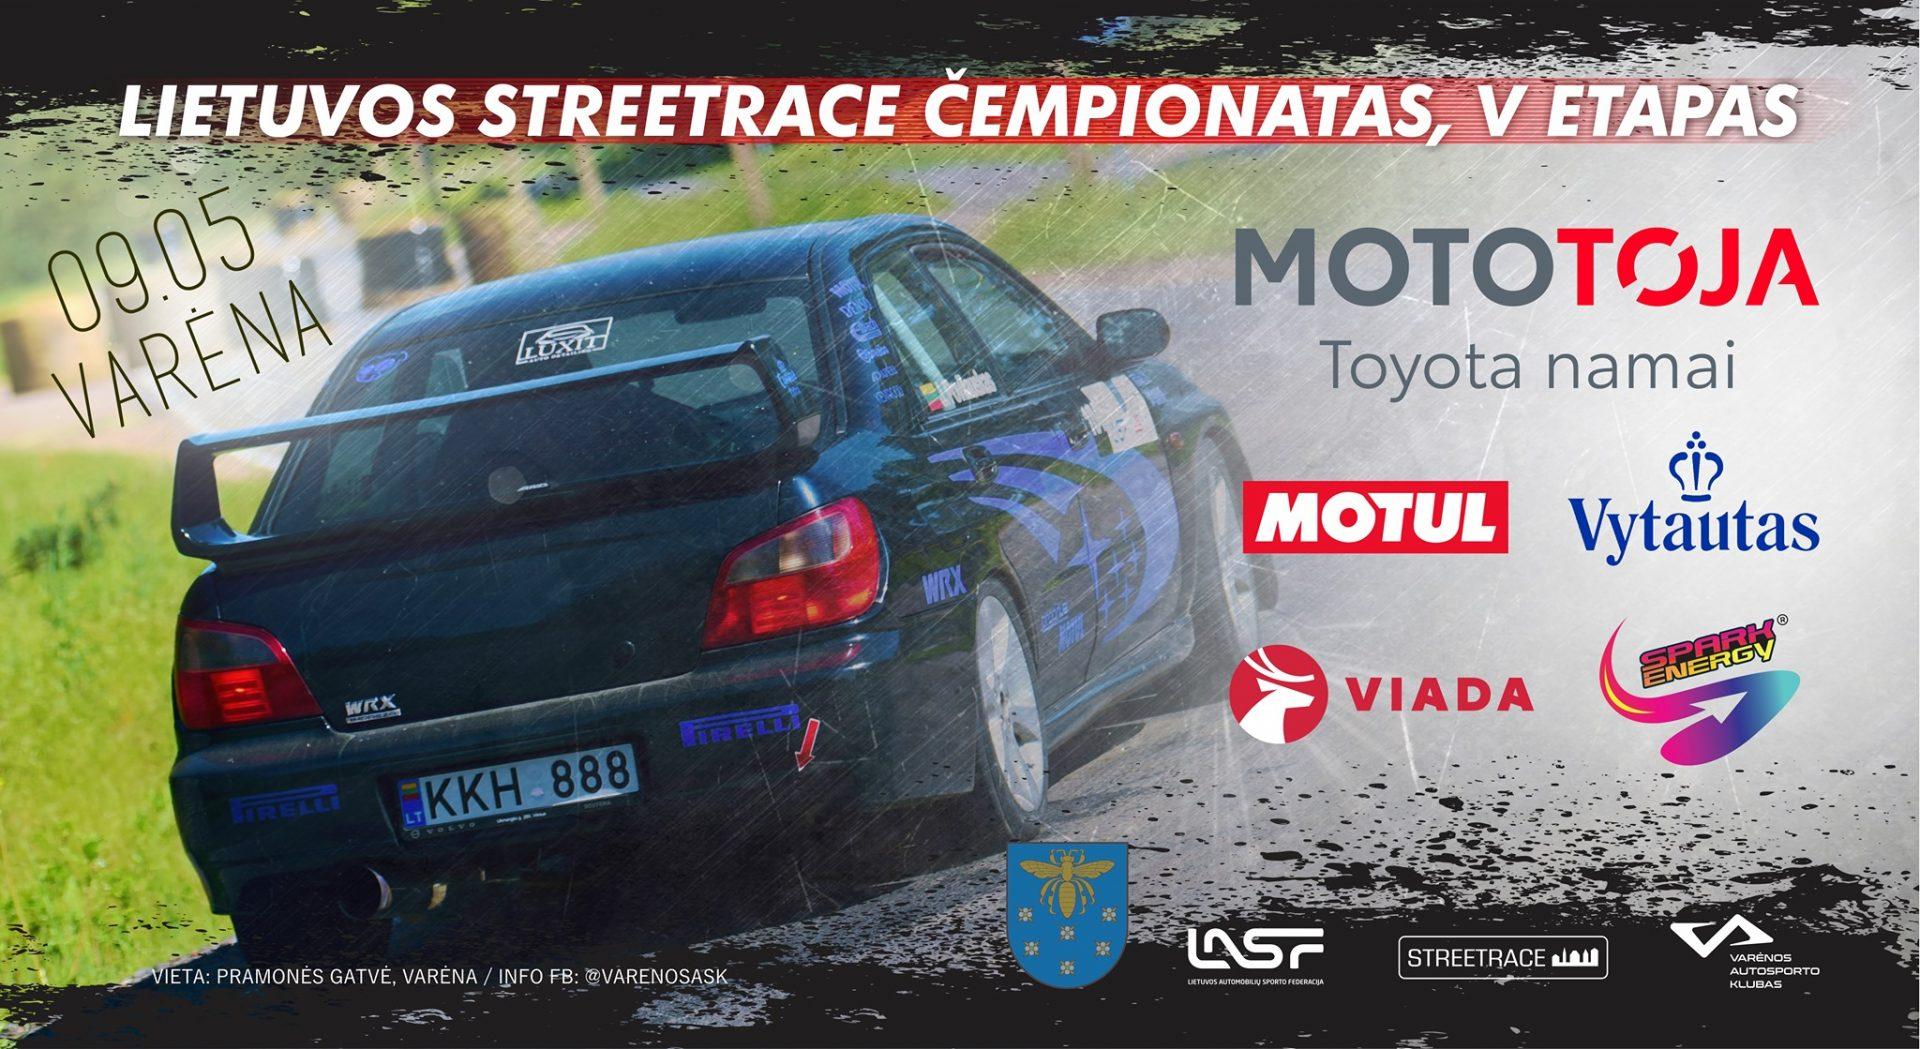 VARĖNA STREET RACE #V etapas